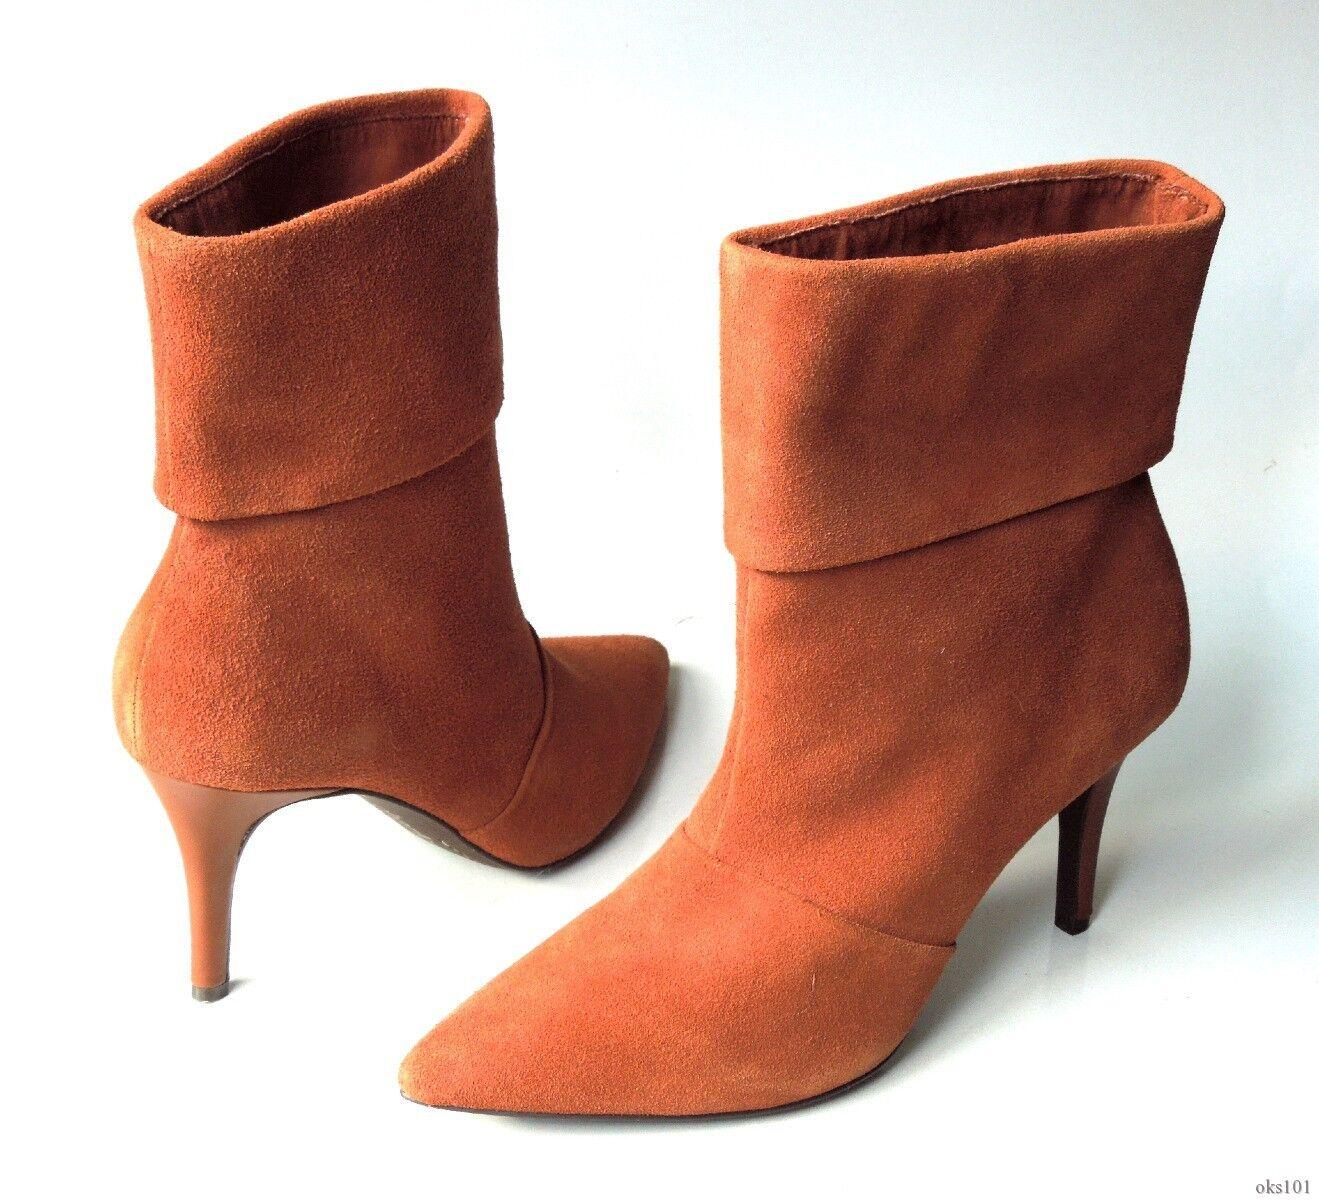 New pointy CHARLES DAVID Braun suede pointy New toe ankle Stiefel 8.5 - classy ecdfbf